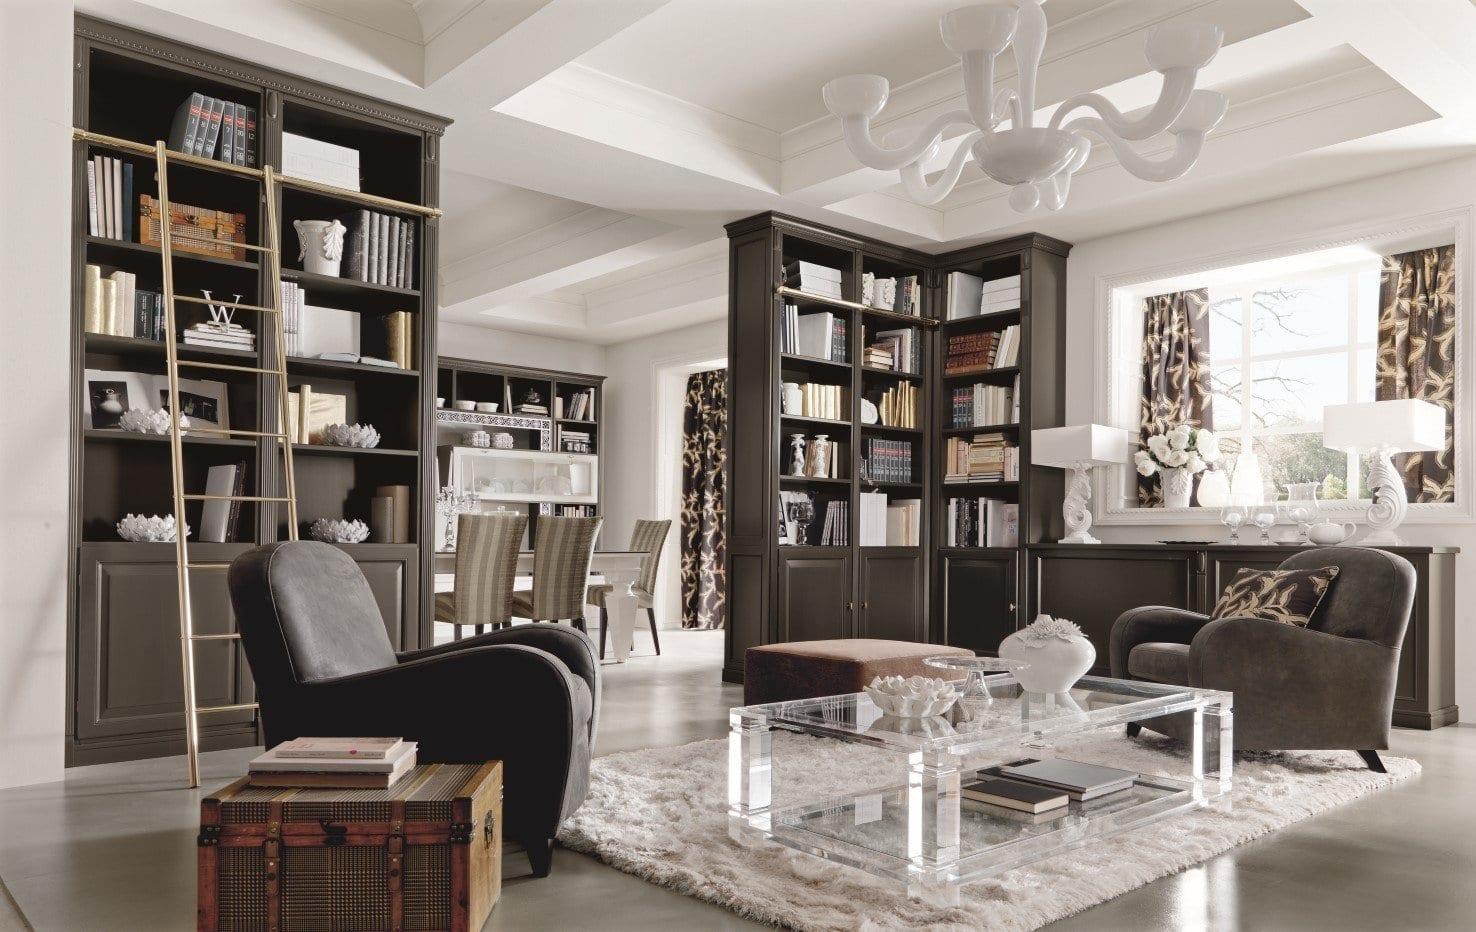 cambridge-ma-residential-renovation-companies-007